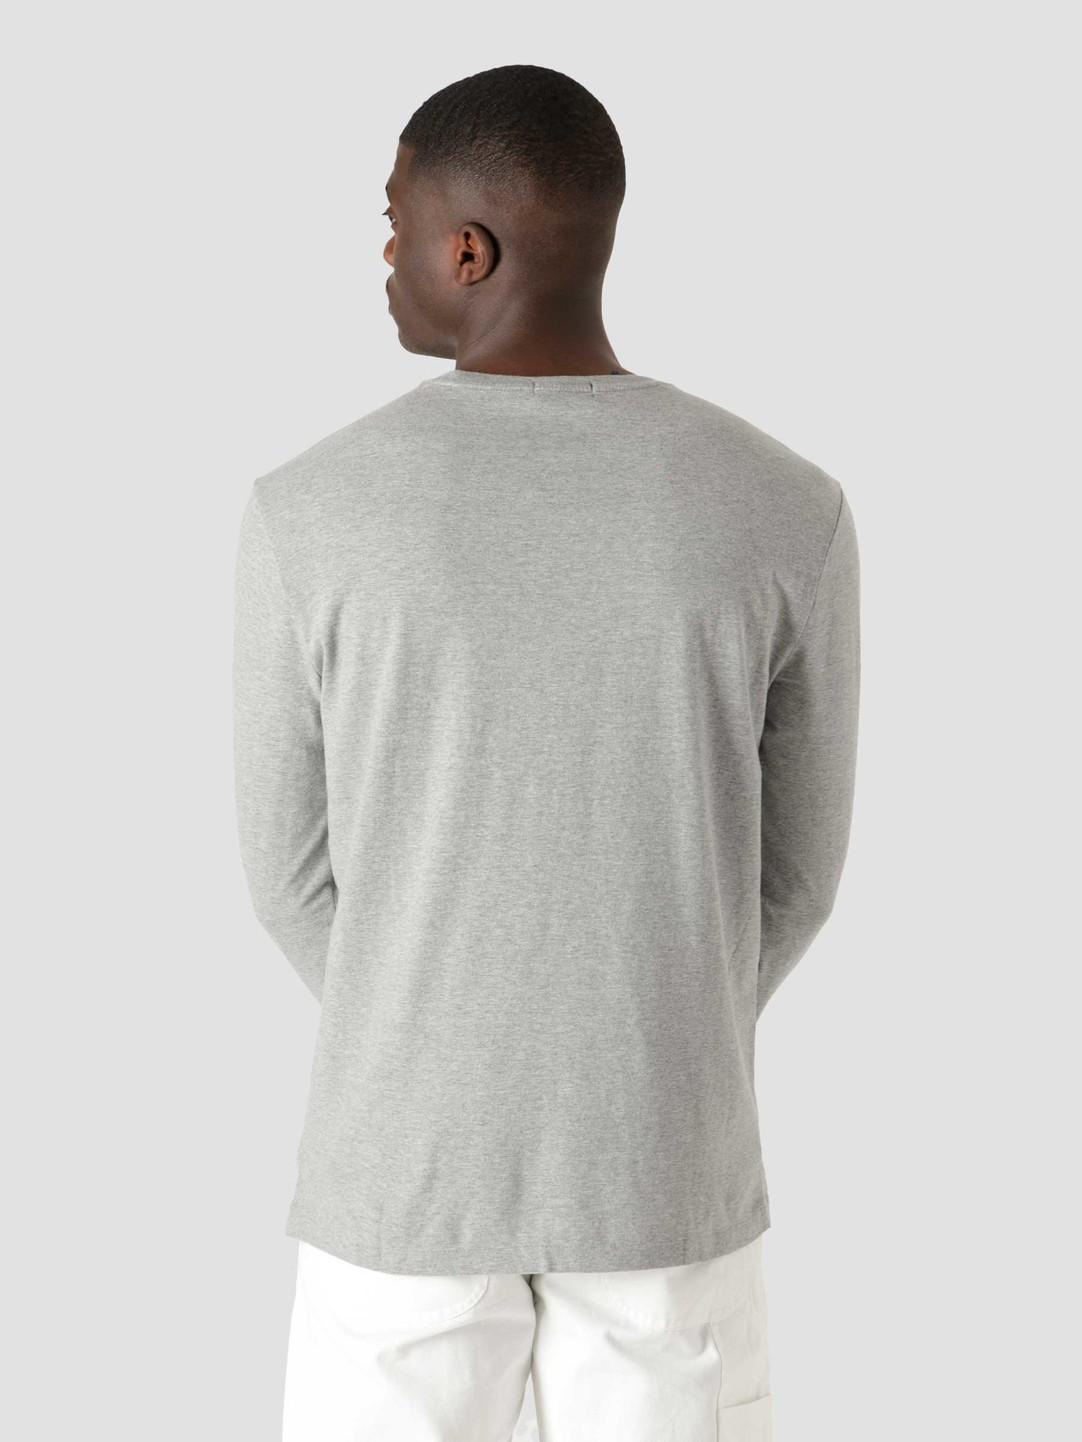 Polo Ralph Lauren Polo Ralph Lauren M Classics 2 Long Sleeve T-Shirt Andover Heather 710828276003